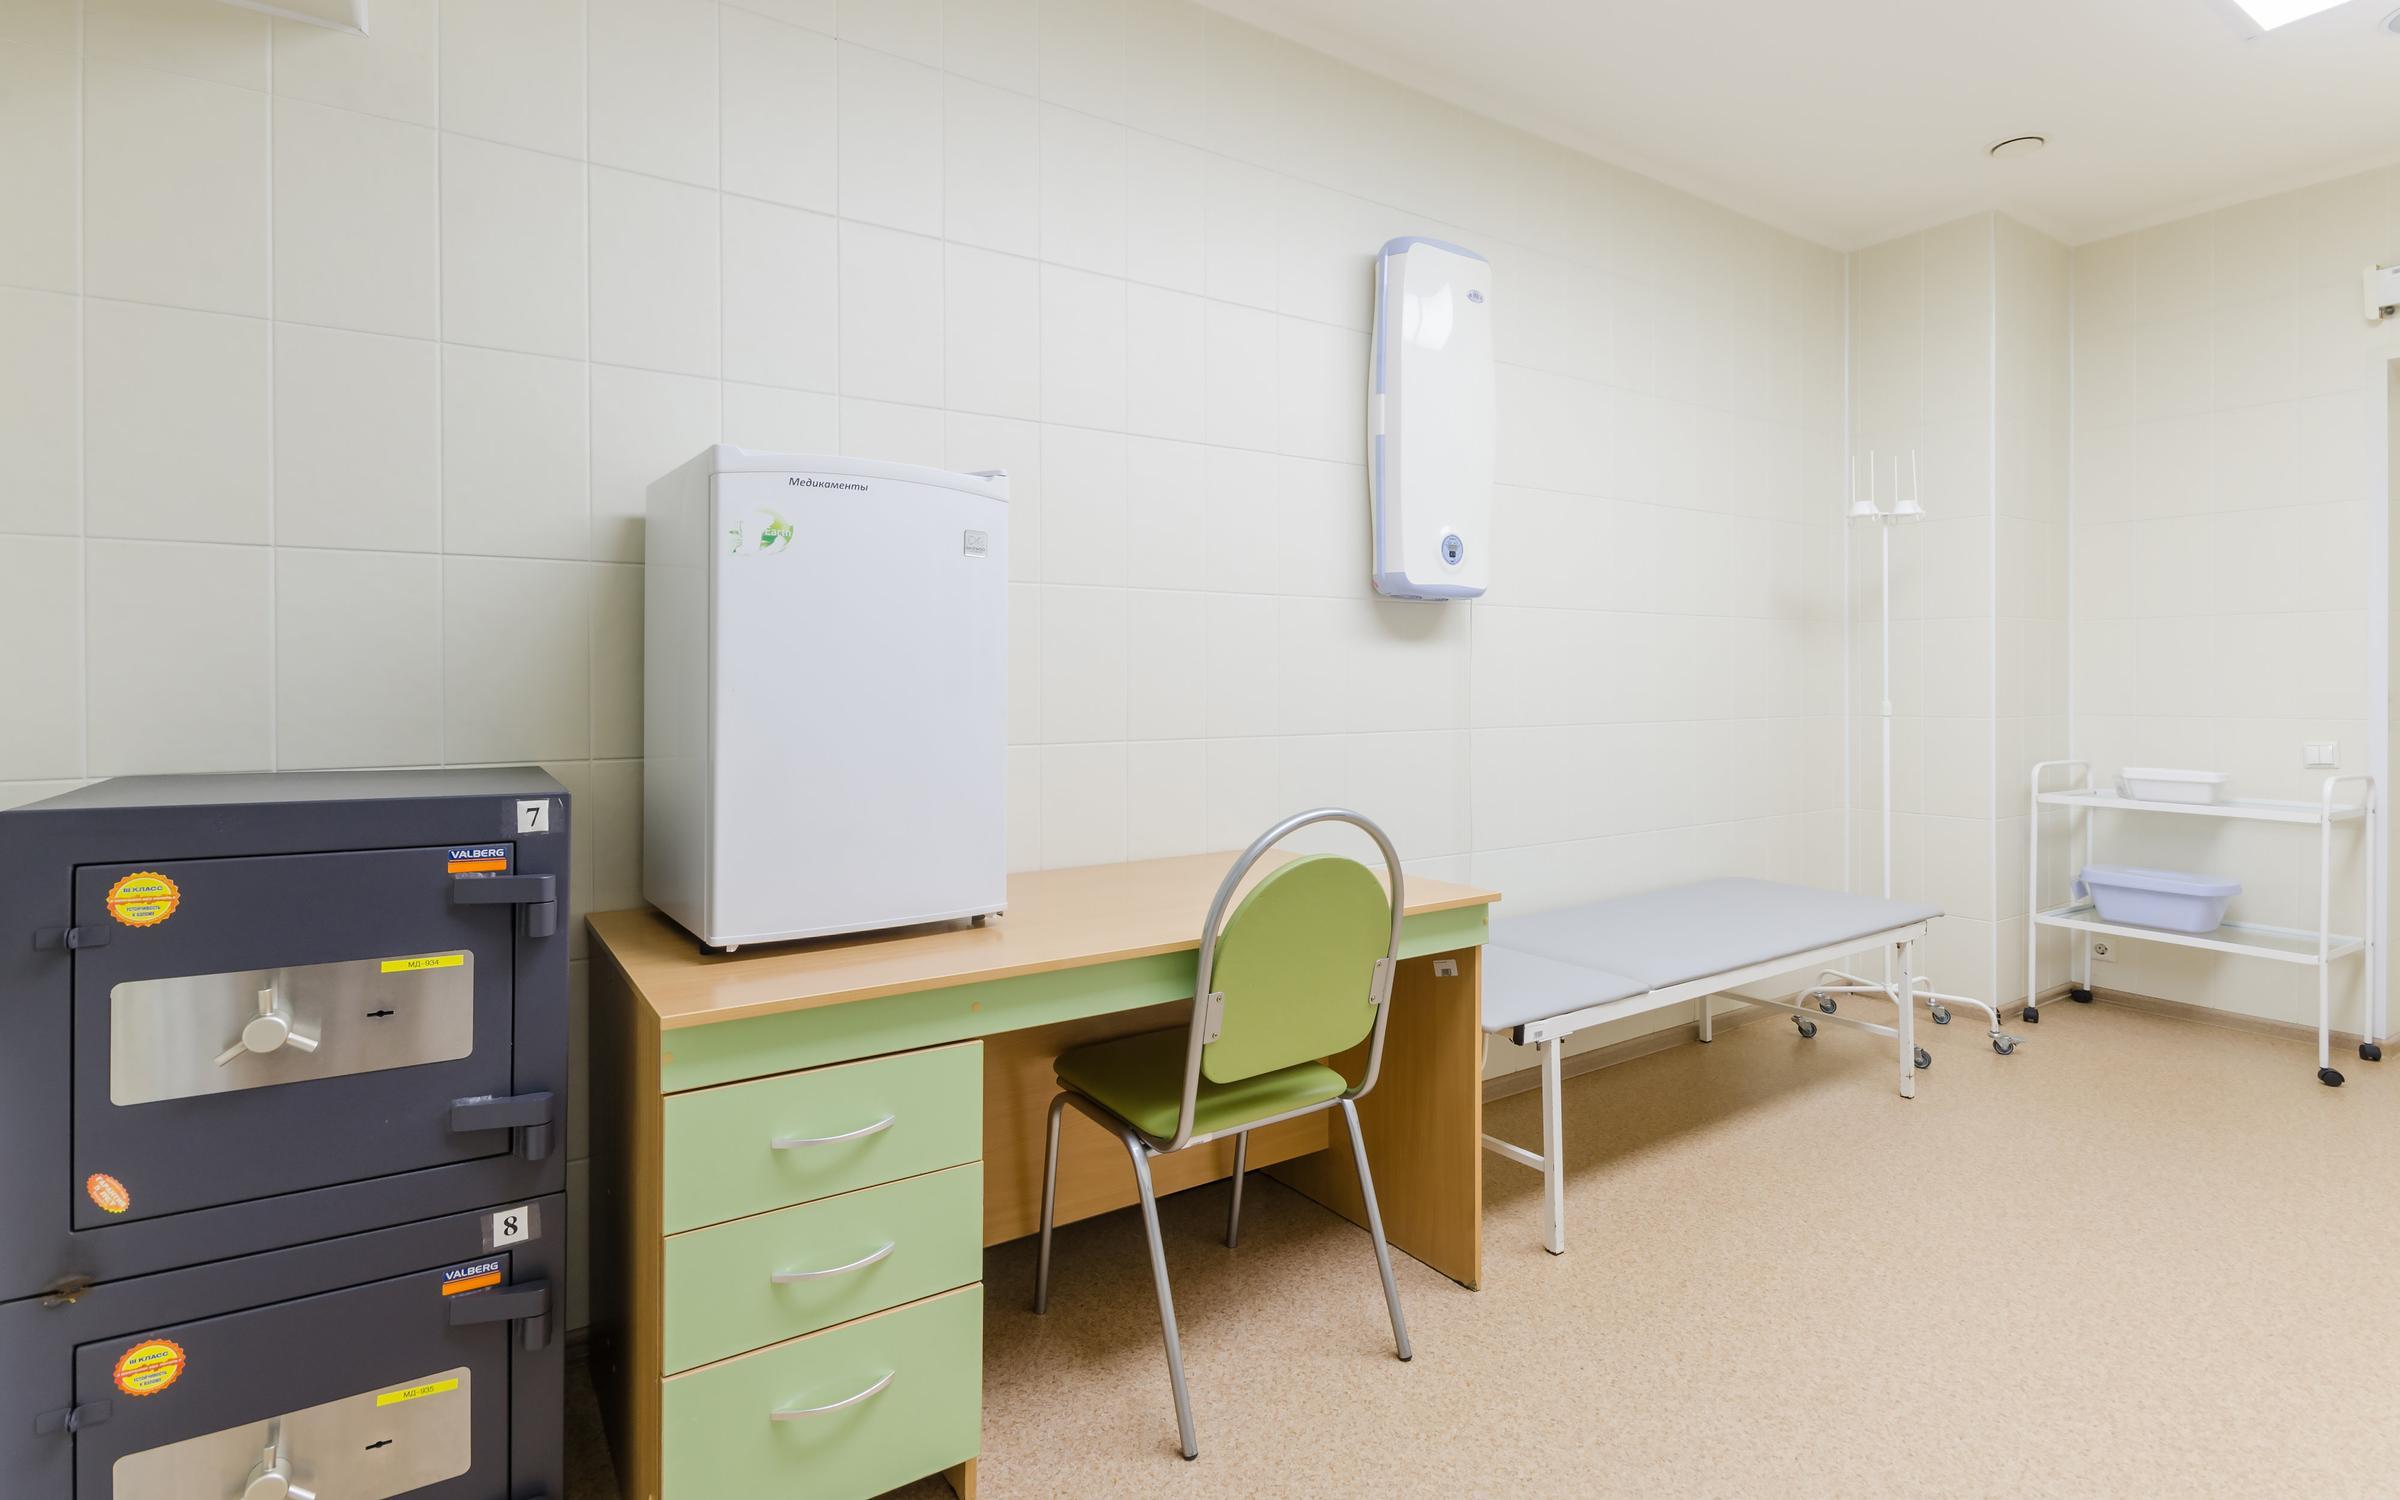 13 больница екатеринбург адрес